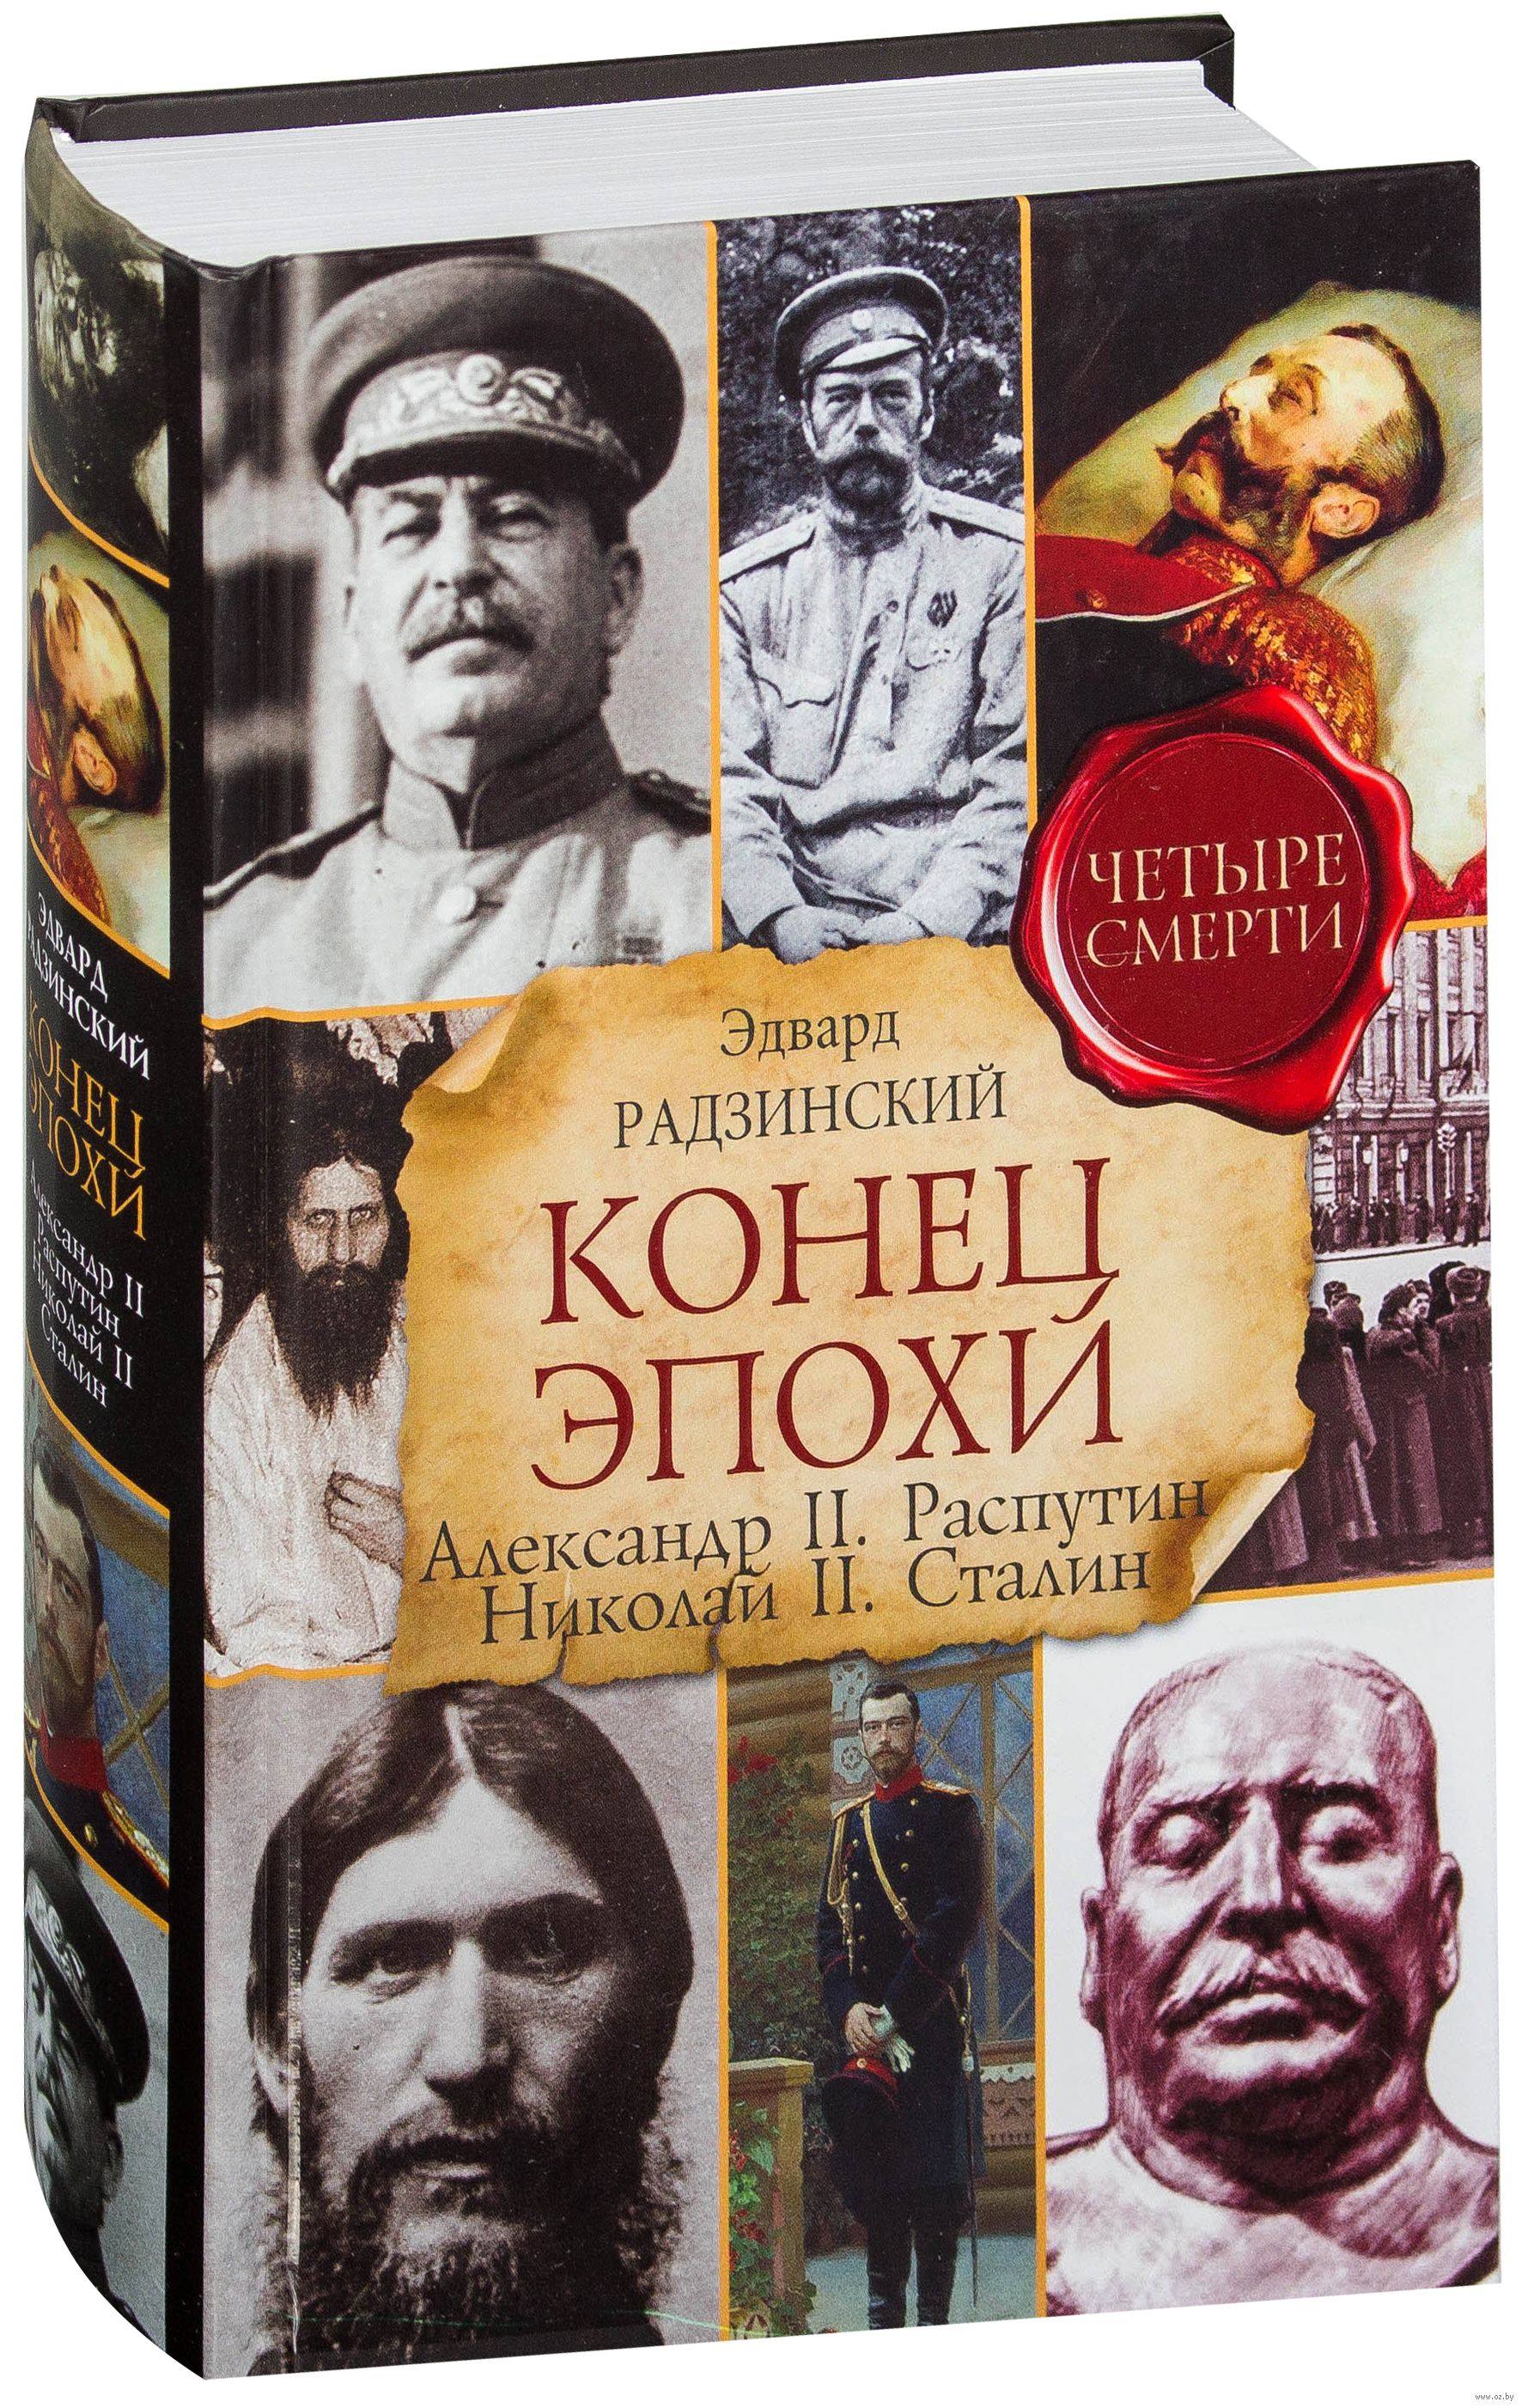 9dcf5217e081 Конец эпохи. Александр II. Распутин. Николай II. Сталин - на OZ.by